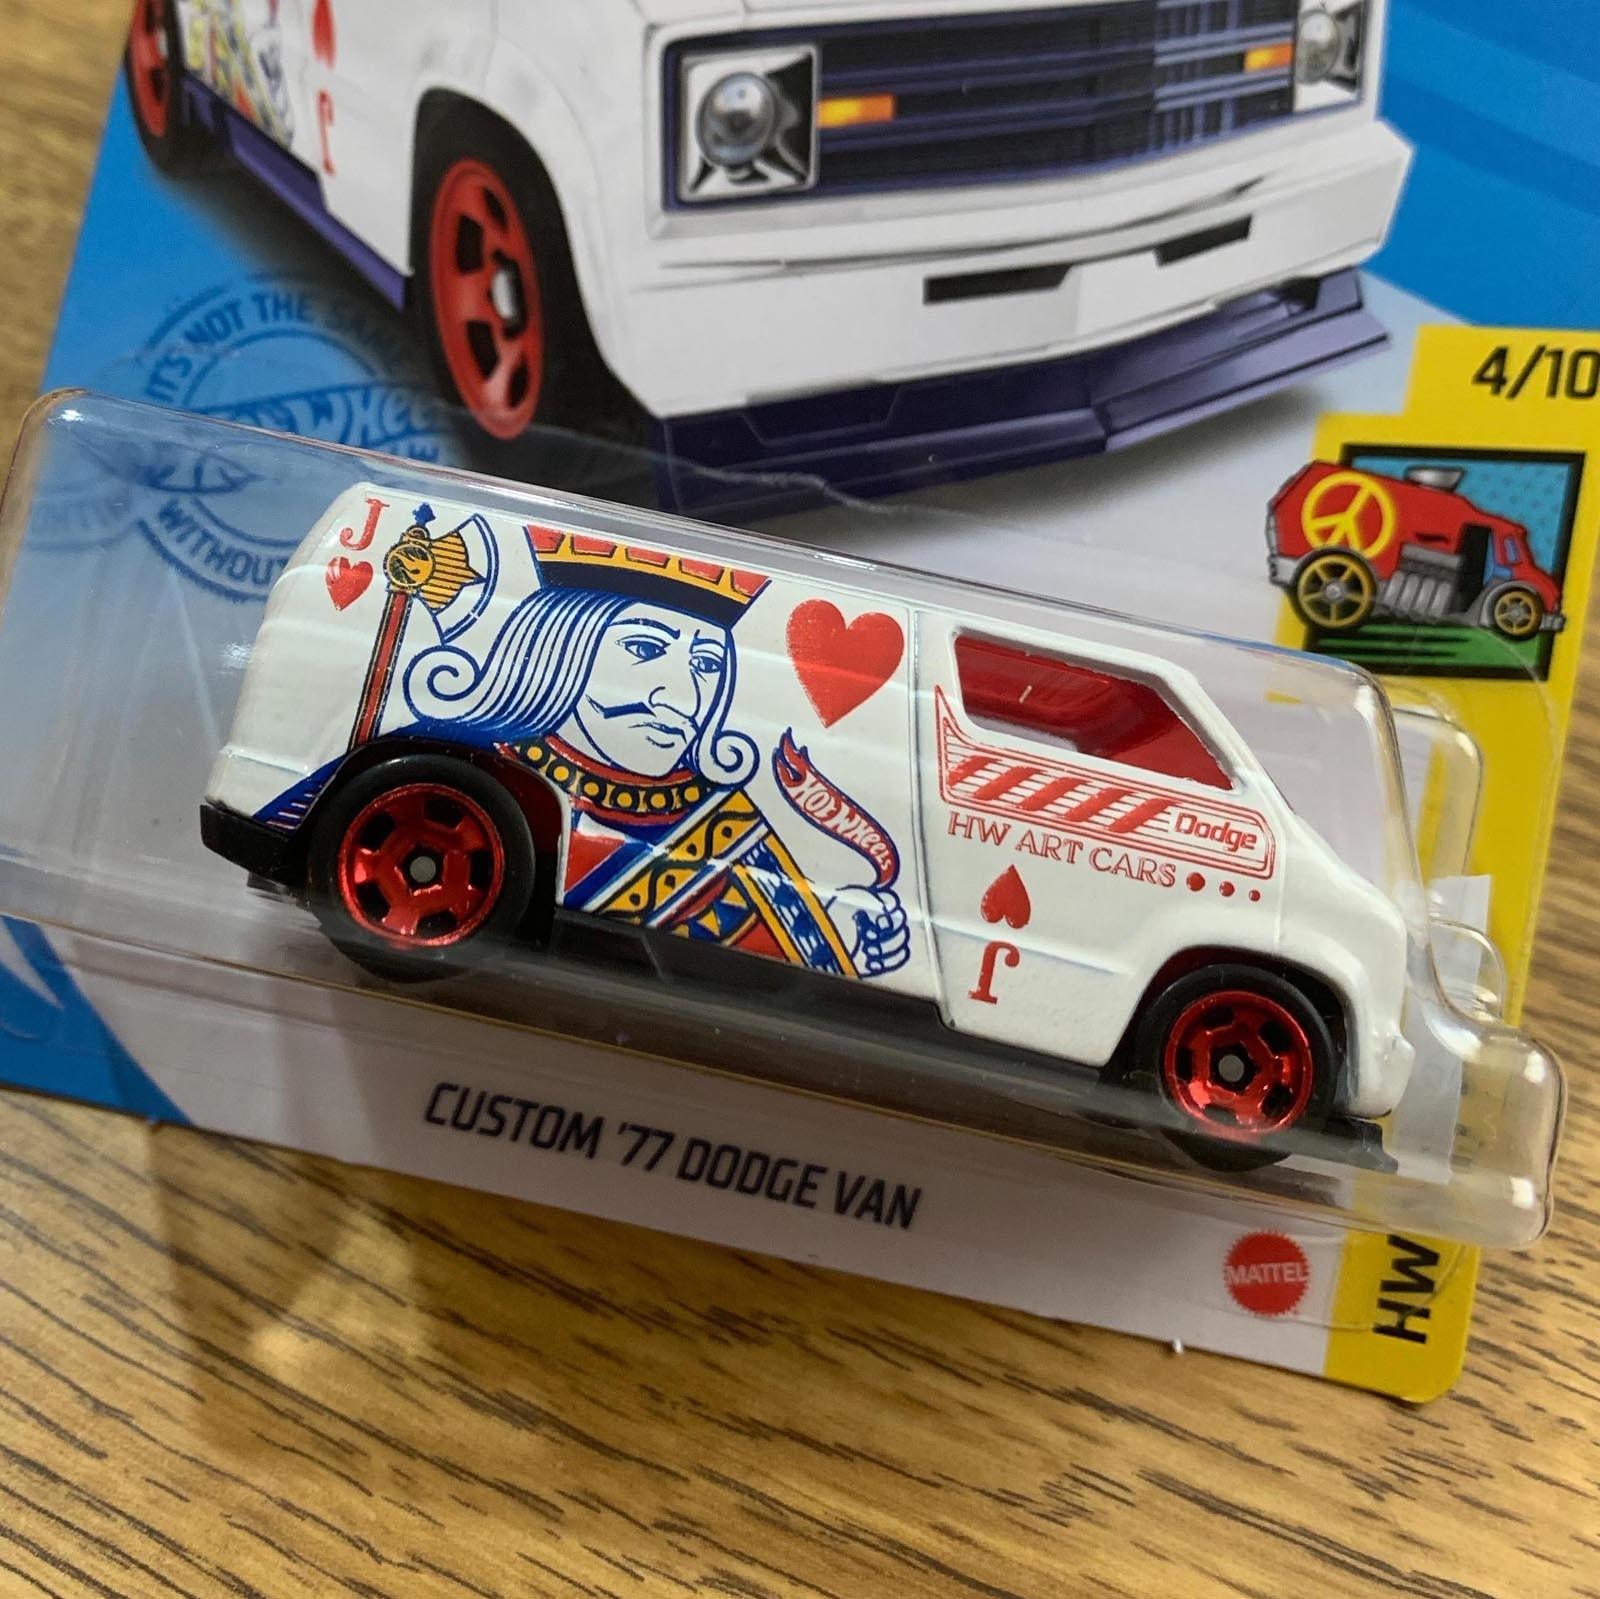 Hot Wheels Custom 77 Dodge Van T Hunt Gtc88 Escala Miniaturas By Mao Na Roda 4x4